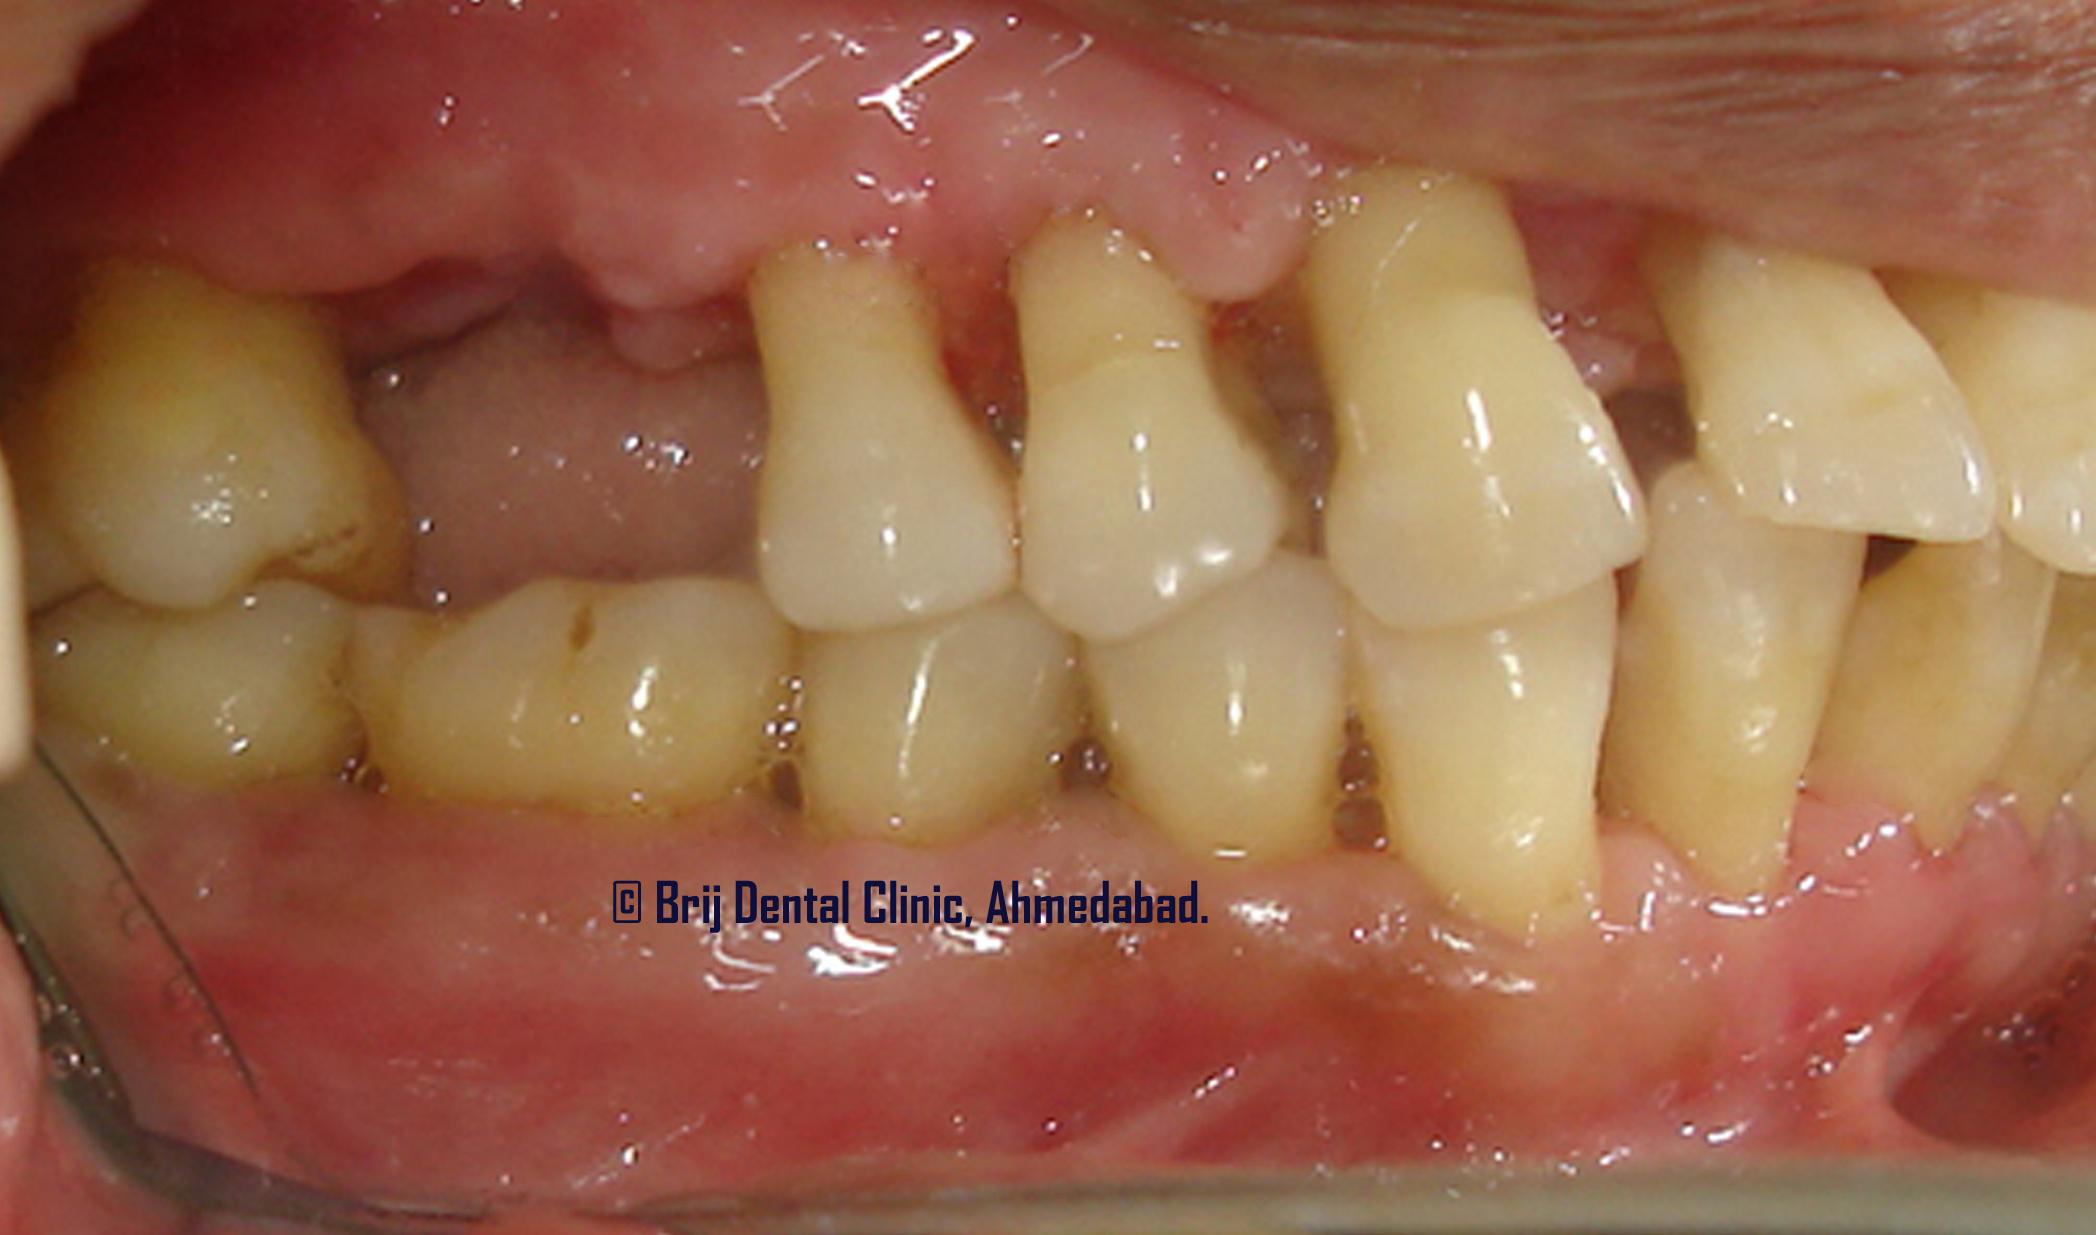 Laser Dental Treatment Gums Cavities Minor Surgeries